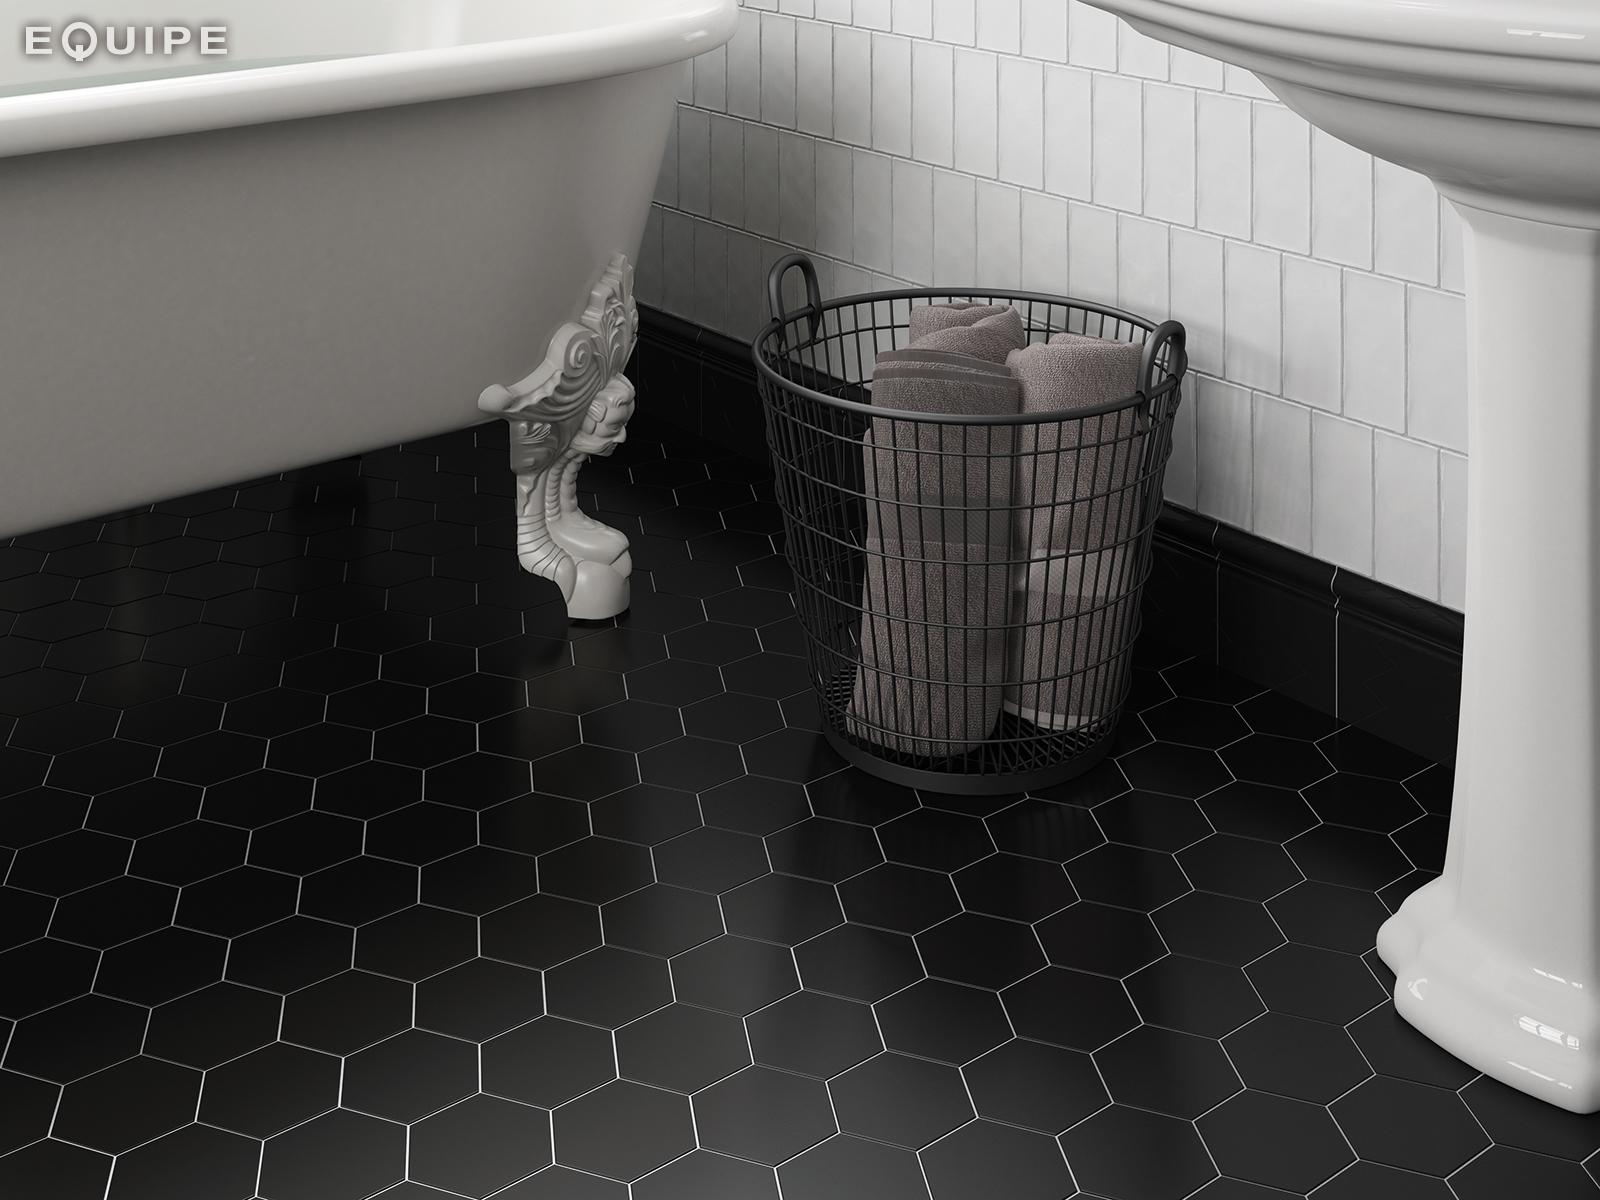 Picture of: 10 1 11 6 Cm Scale Hexagon Black Mat Helsingor Flisecenter